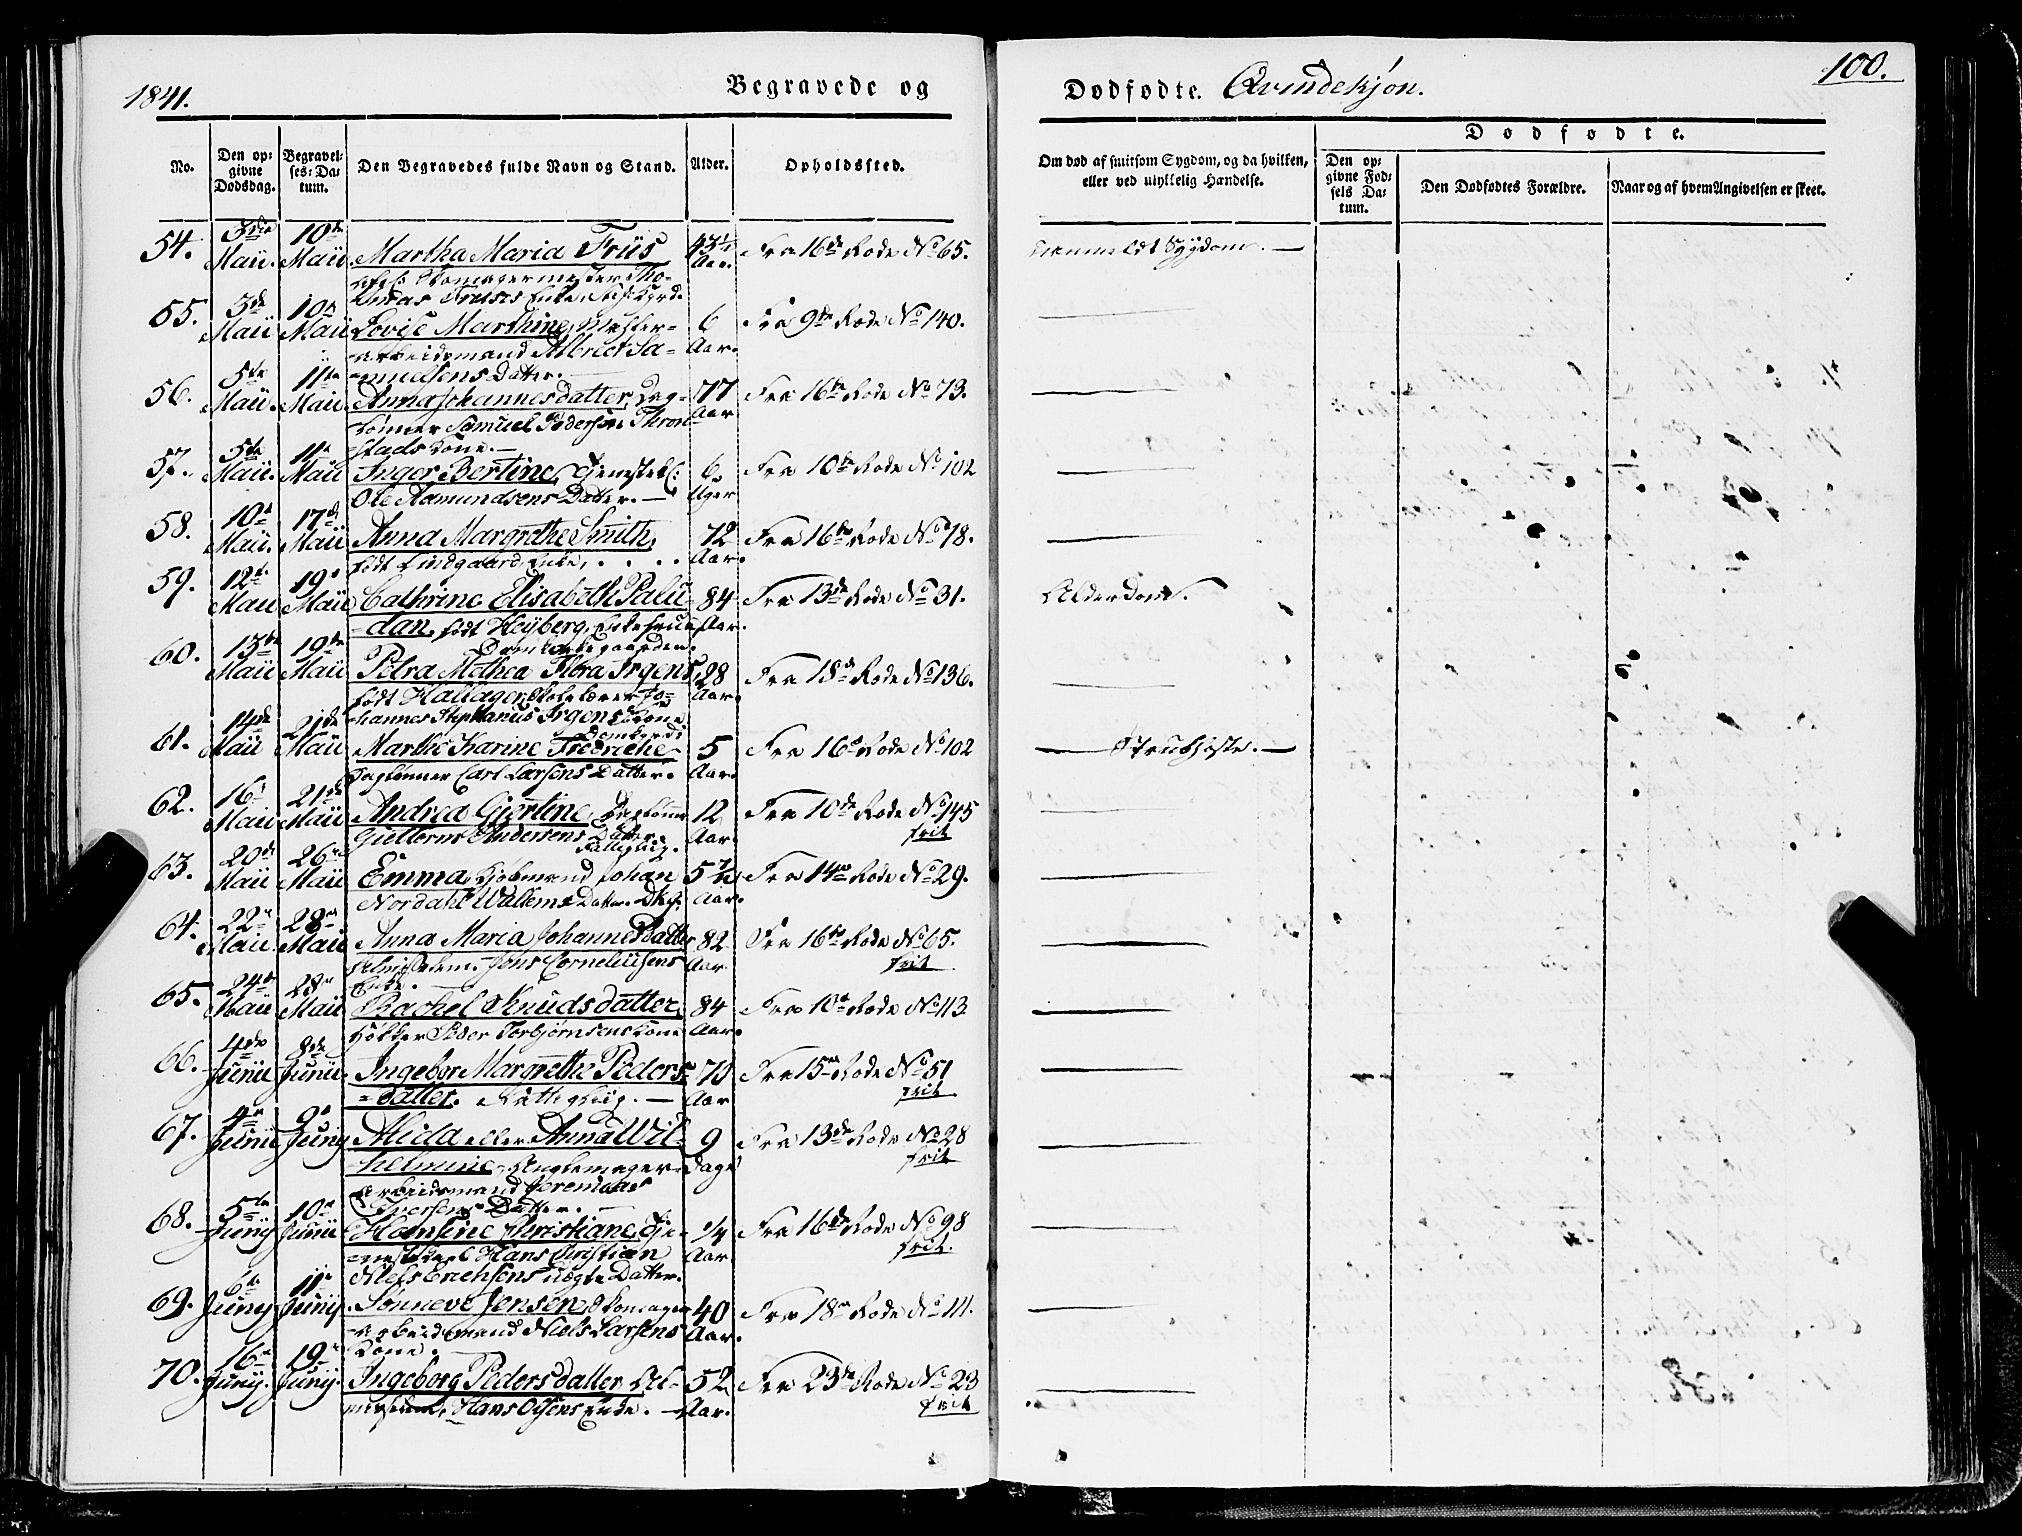 SAB, Domkirken sokneprestembete, H/Haa/L0040: Ministerialbok nr. E 1, 1841-1853, s. 100